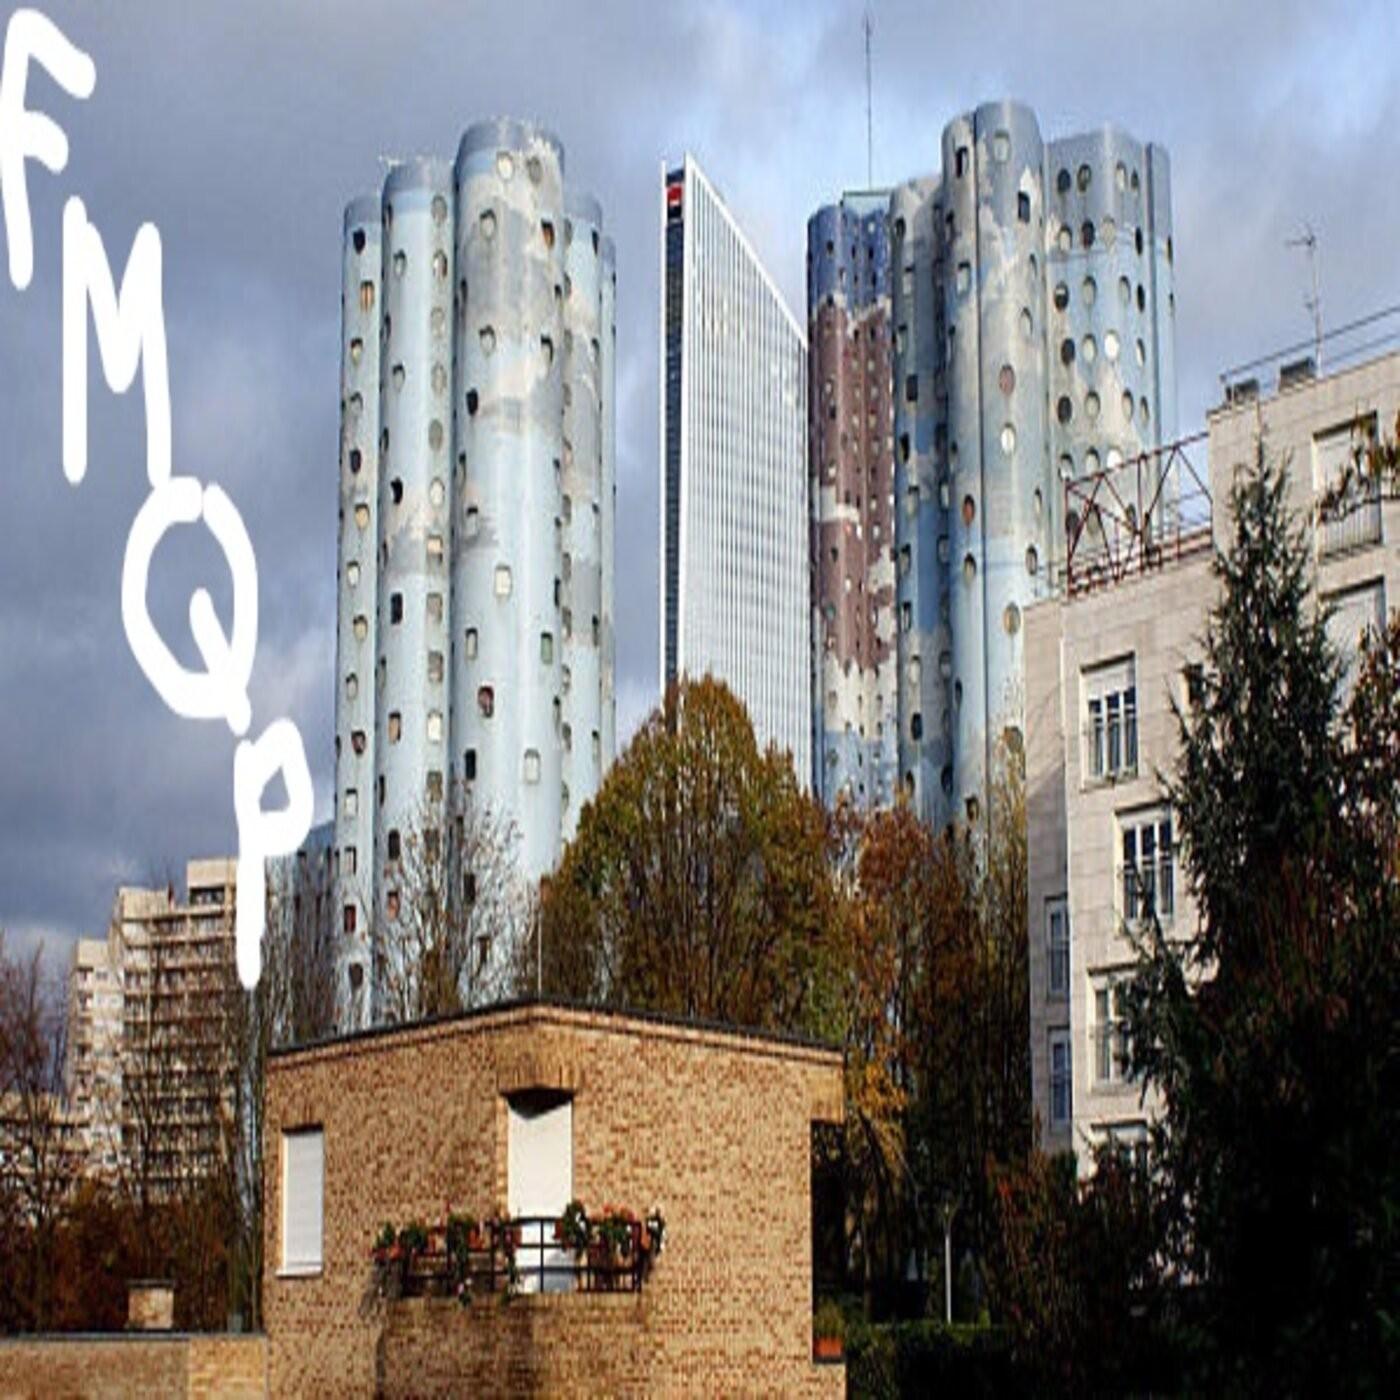 F.M.Q.P. (L'émission)